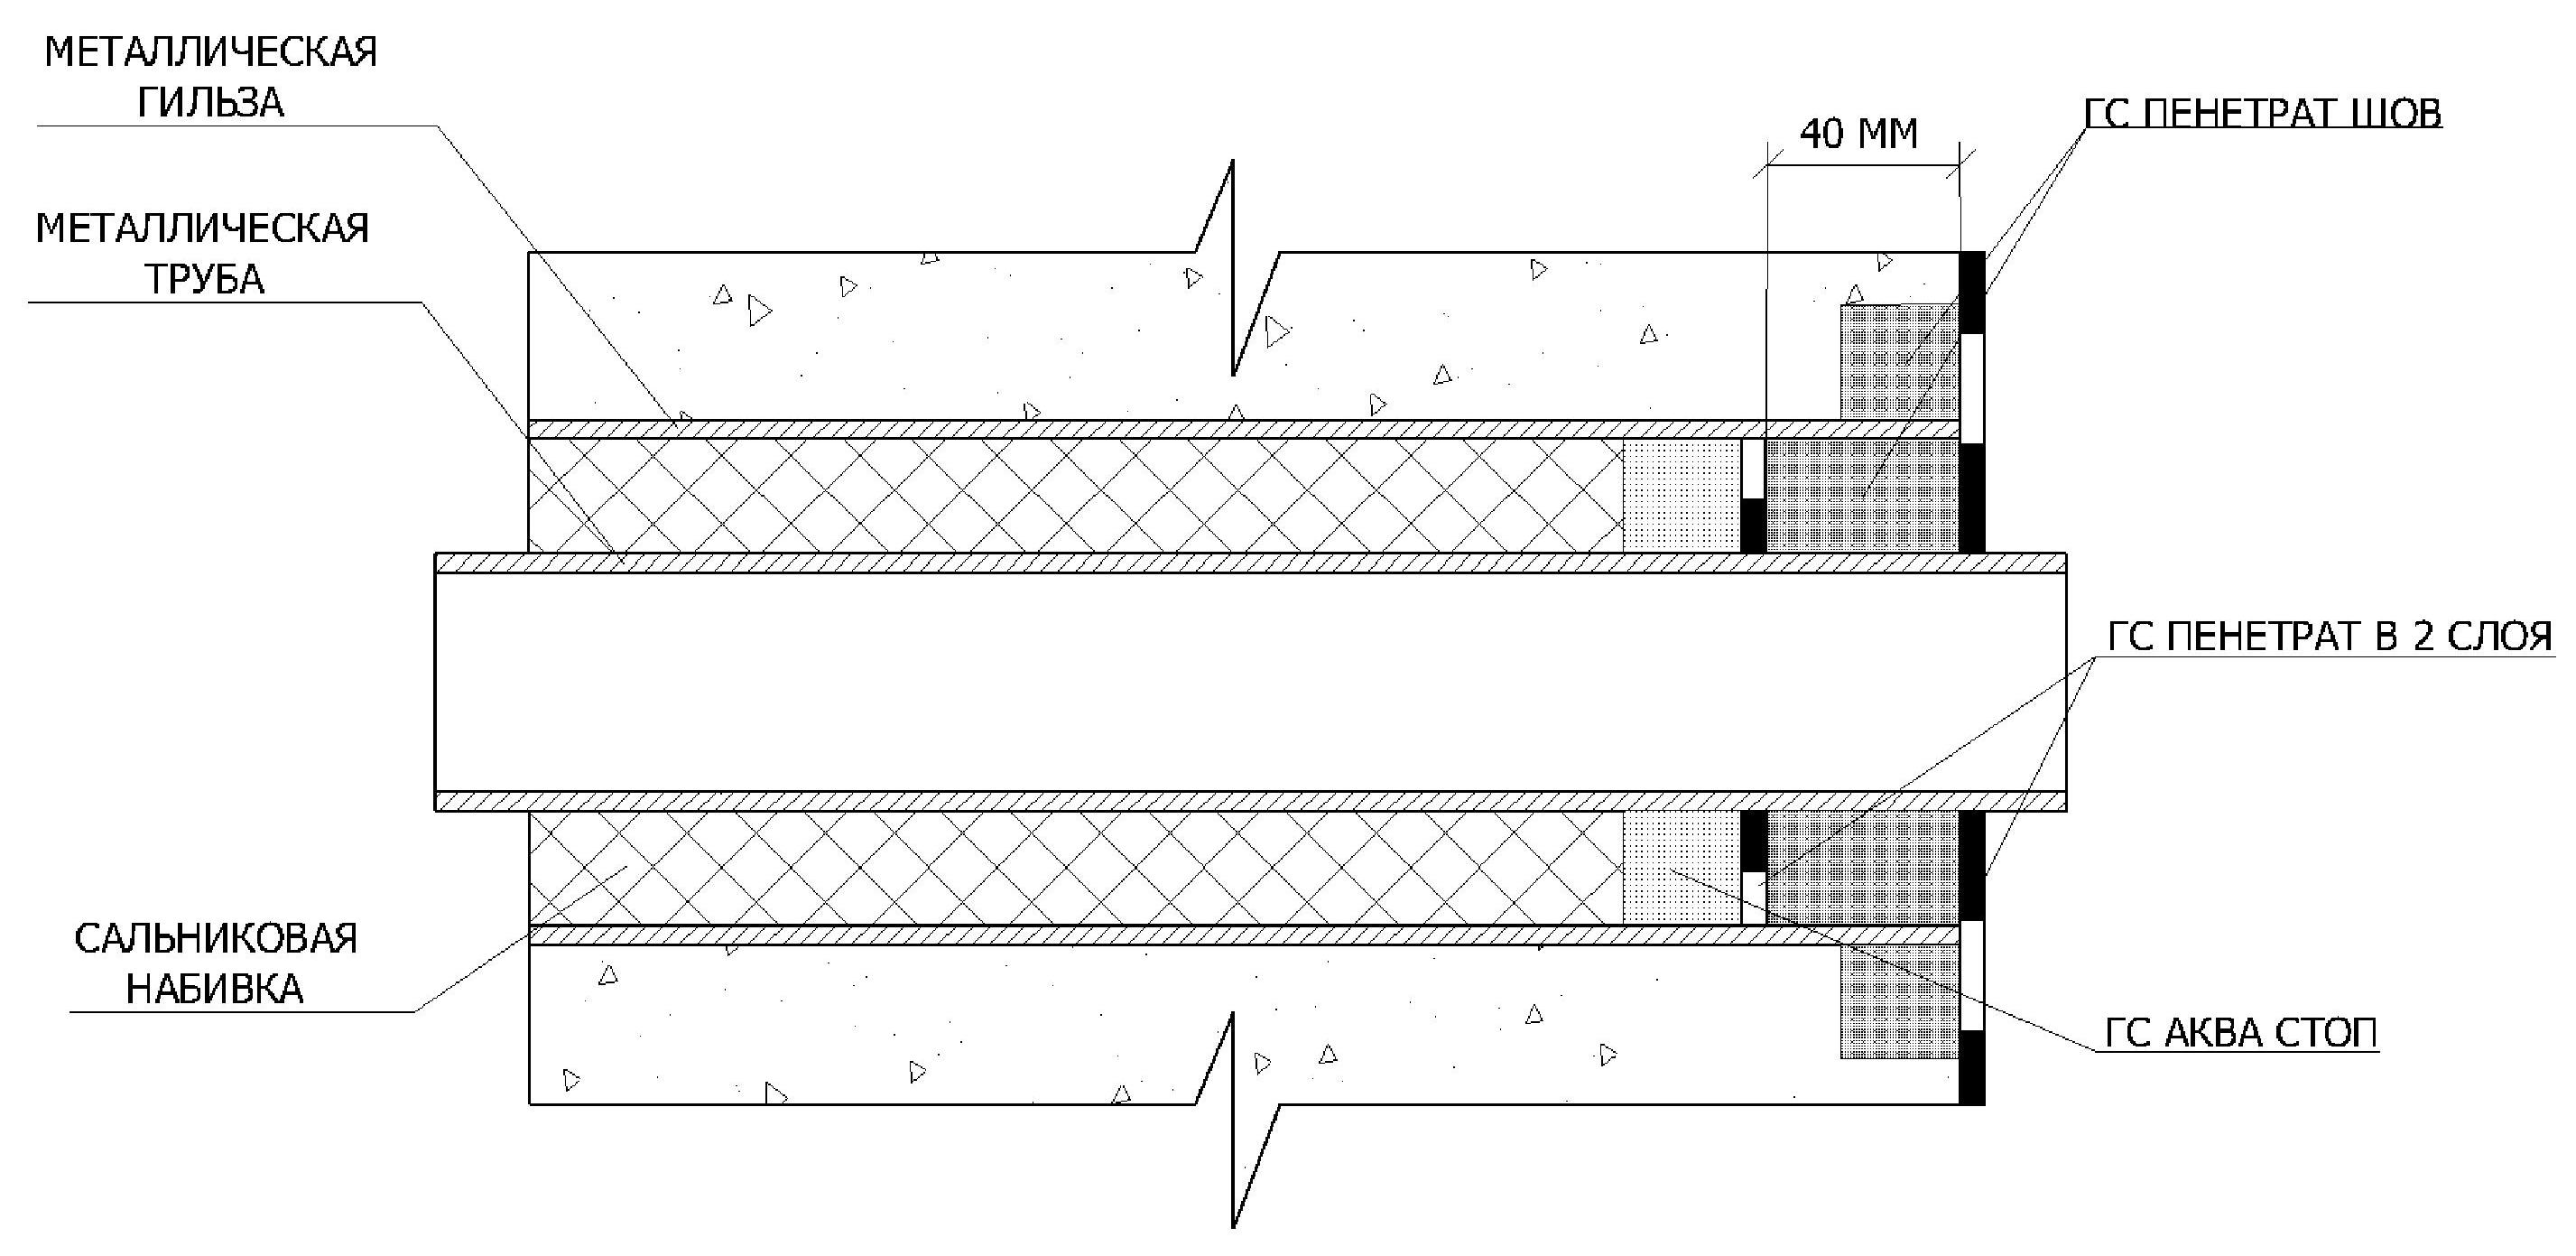 Гидроизоляция ввода коммуникаций фундамента гидроизоляция эламинатор